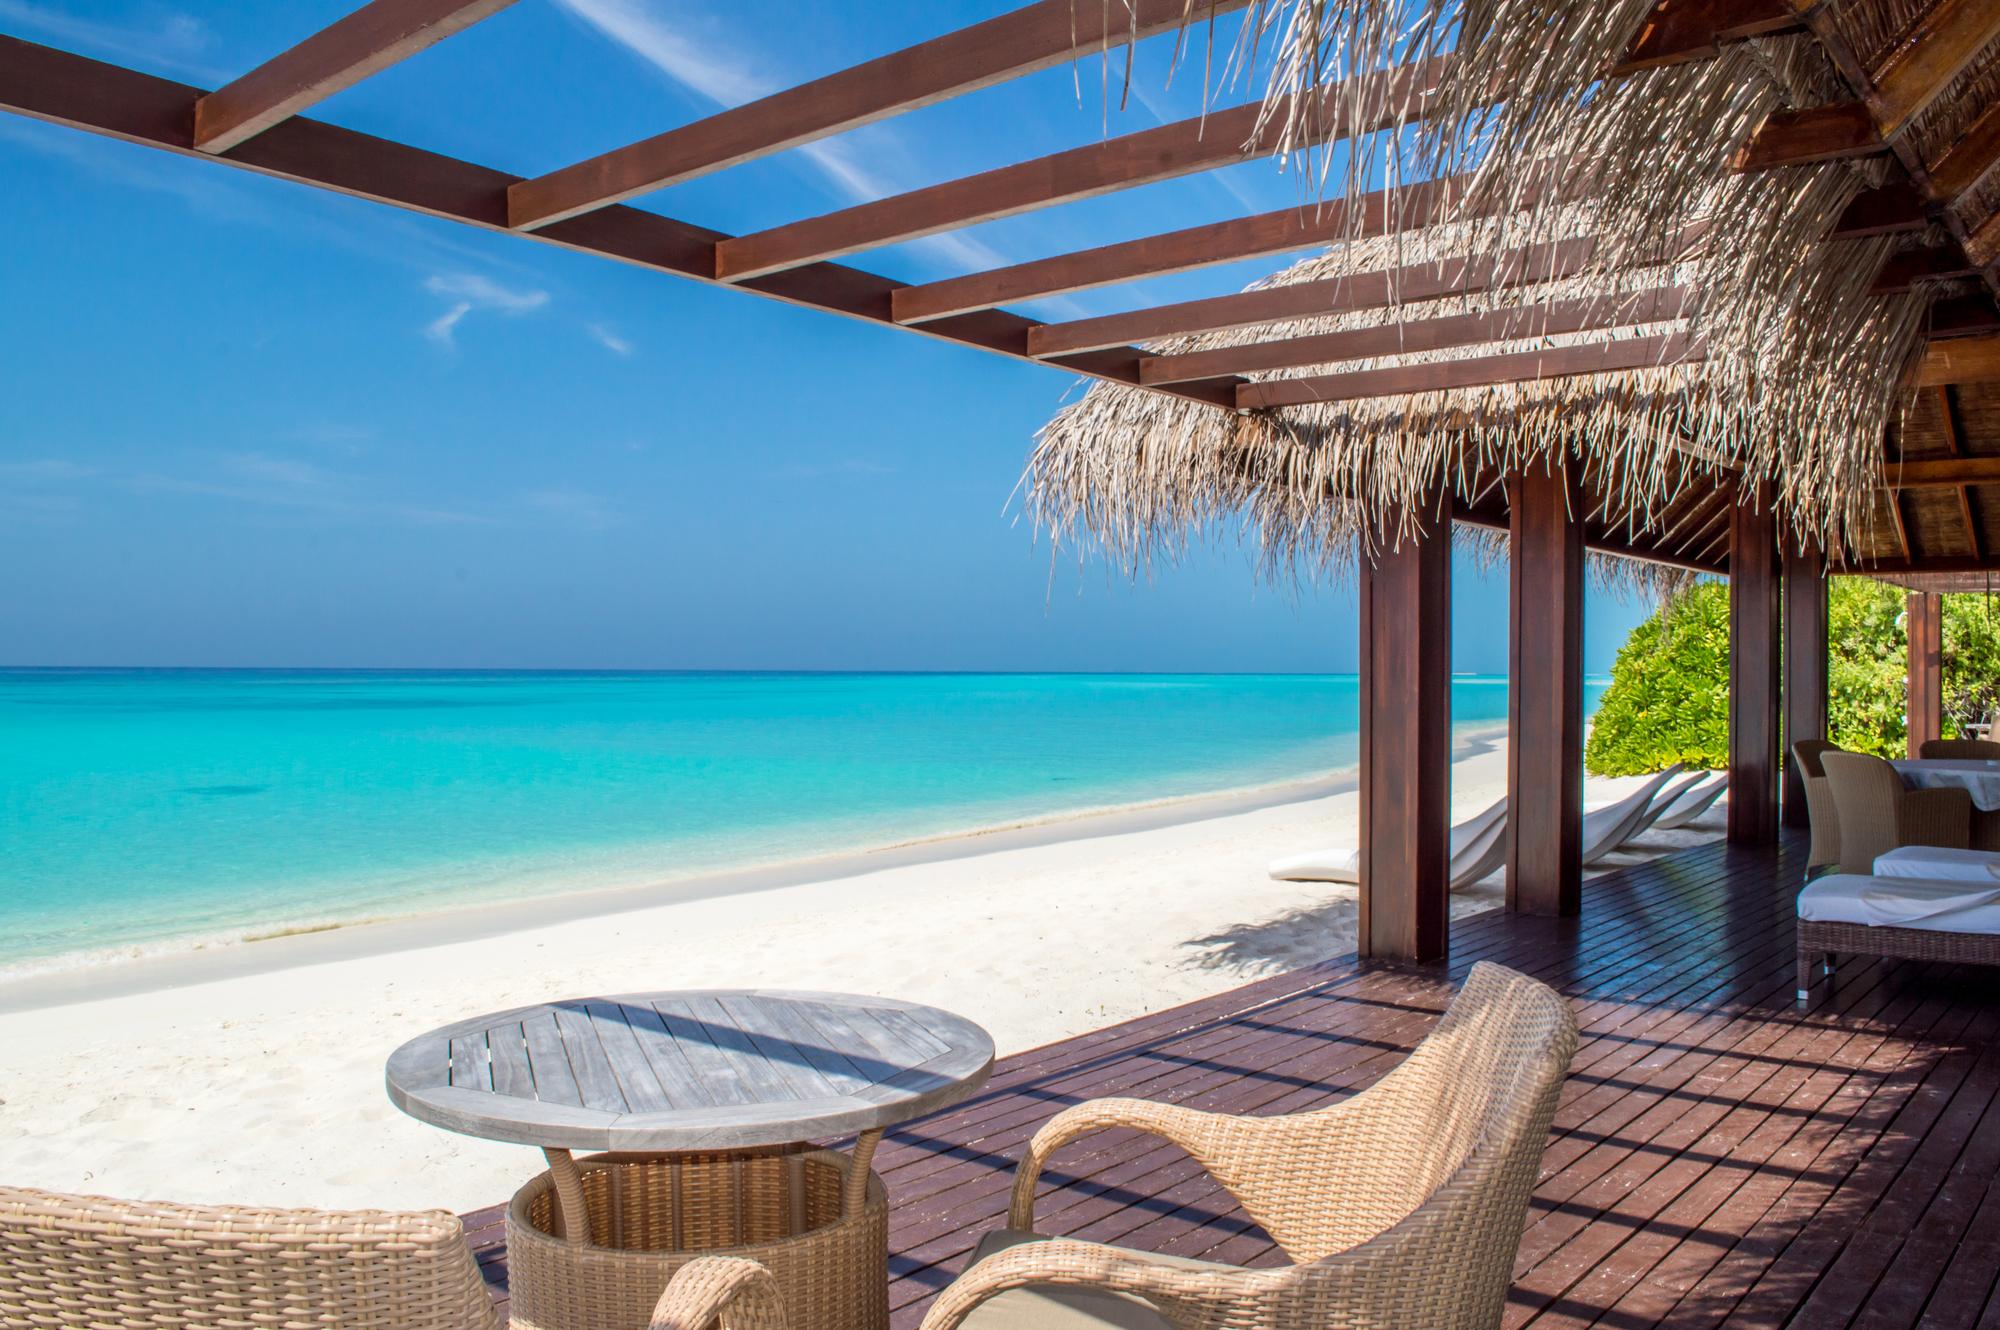 Mauritius fl ge mit eurowings nonstop hin und zur ck 420 for The best beach resorts in the world